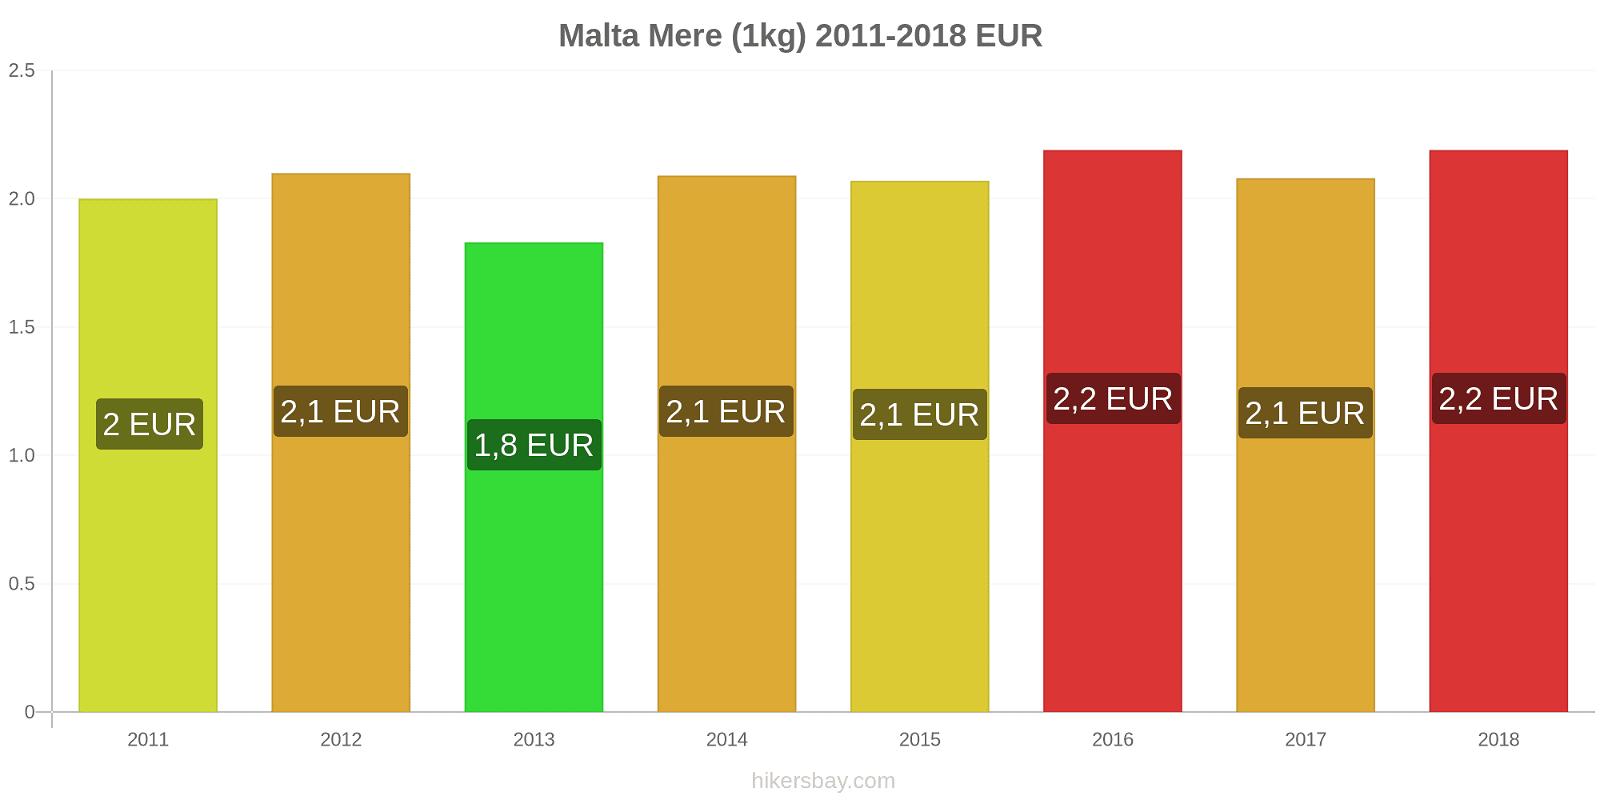 Malta modificări de preț Mere (1kg) hikersbay.com